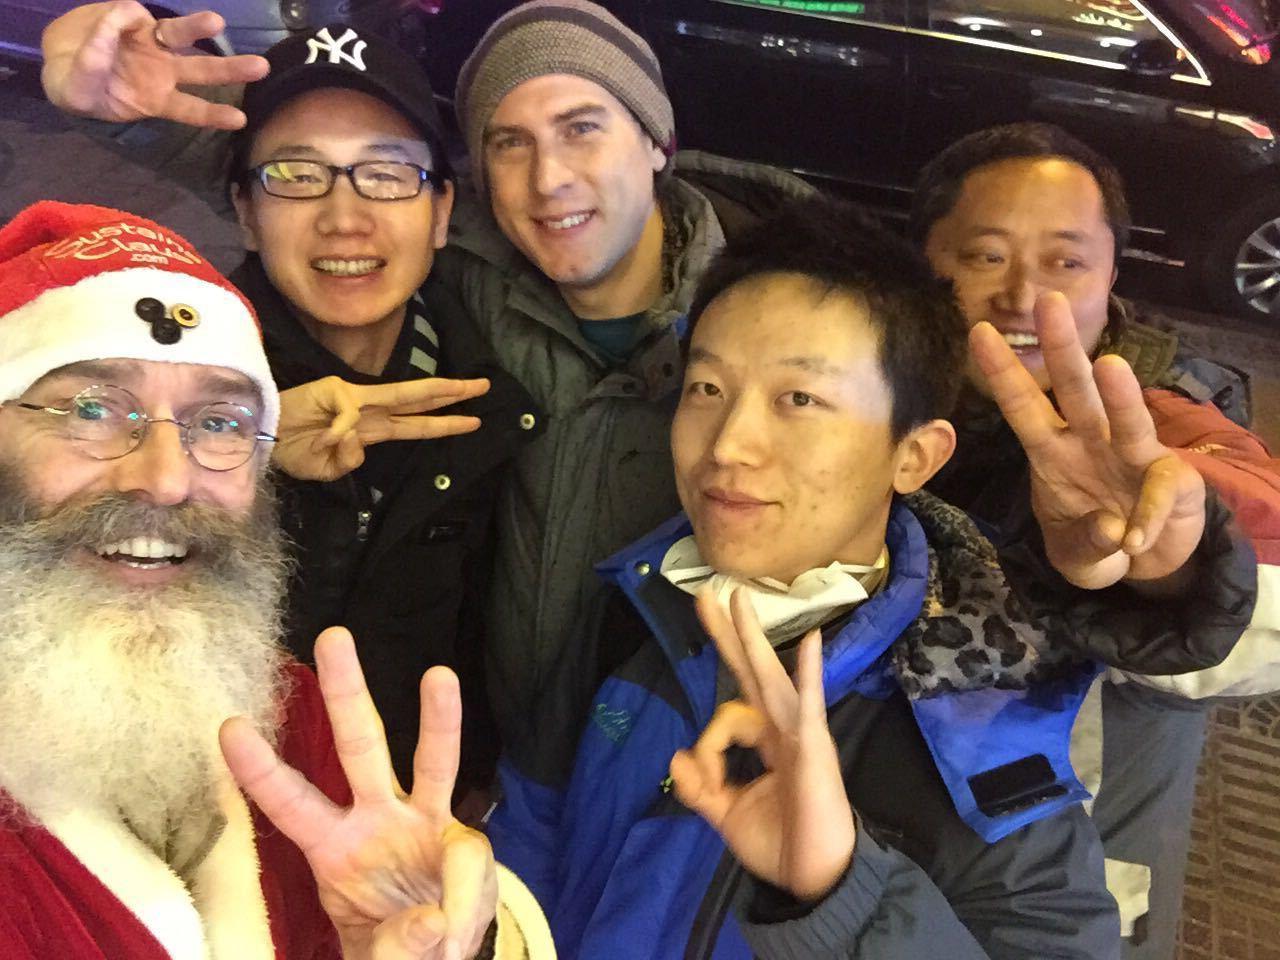 Back row: Jerry Zhang, Jeremiah Bilas; Front row: Phillip McMaster, Jack Lee, Hua Chong Wen at Christmas Dec 25 Predictions Dinner in Beijing